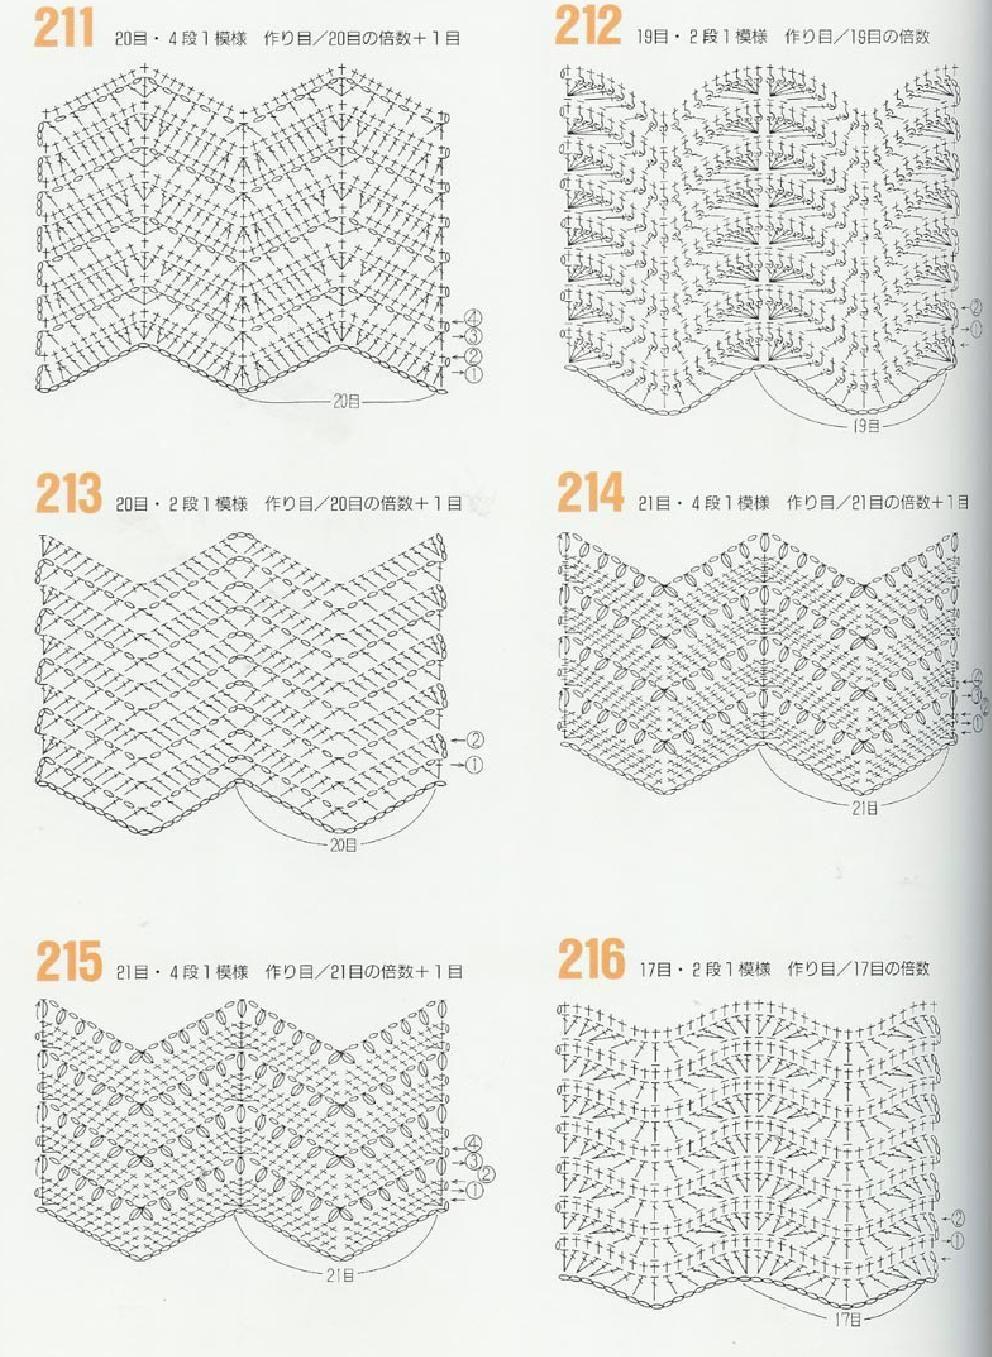 262 patrones crochet | Pinterest | Patrones, Crochet and Stitch